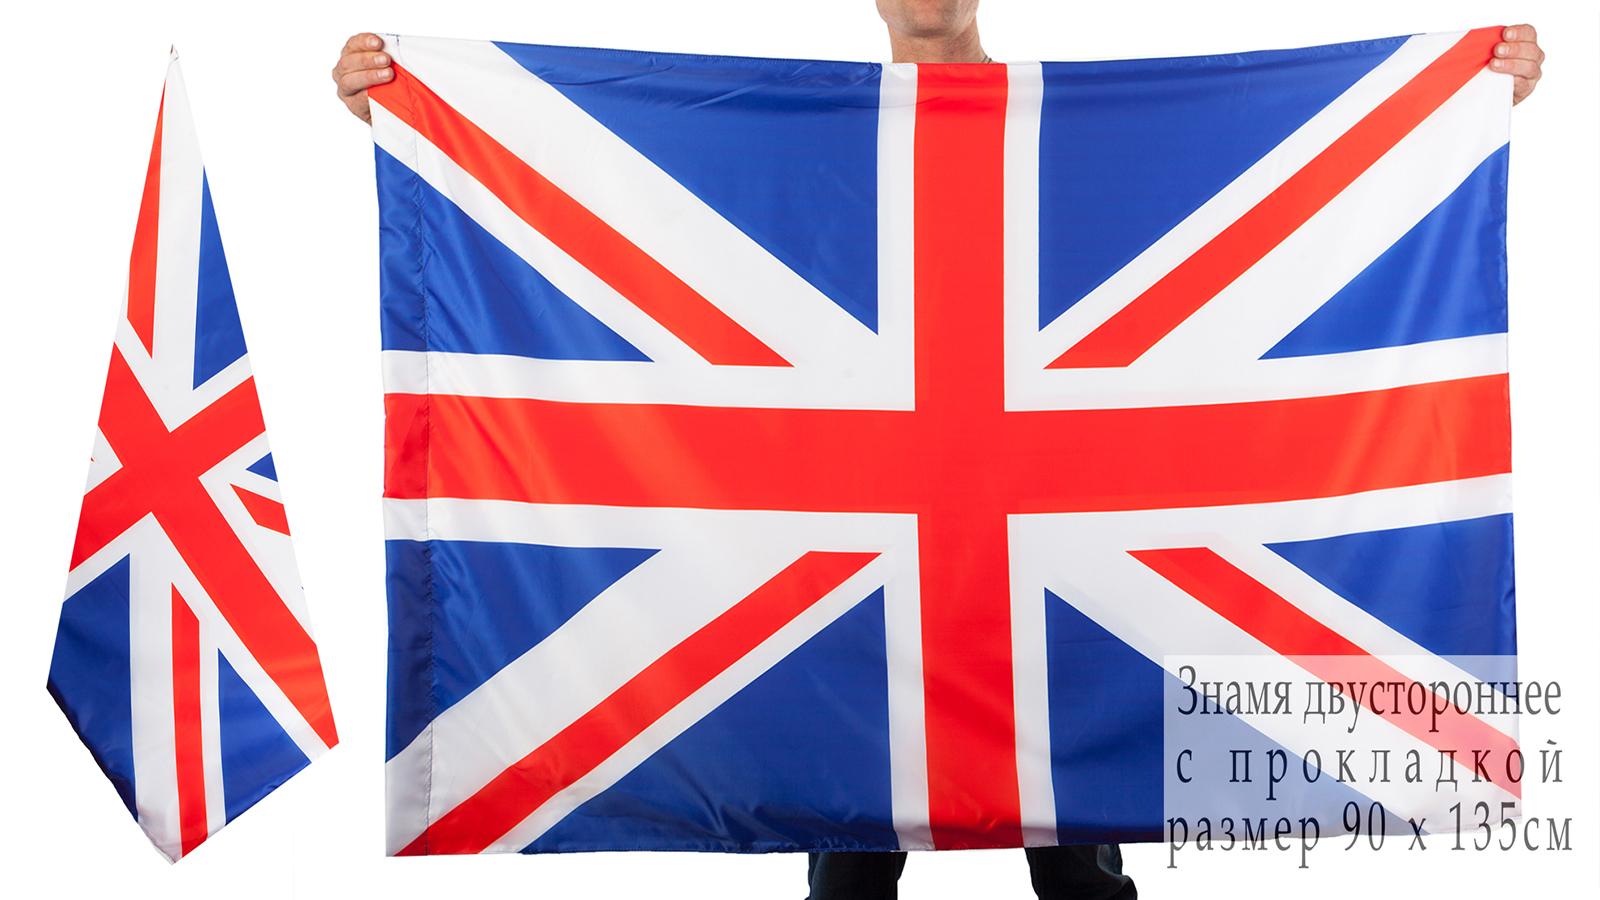 Двухсторонний флаг Великобритании